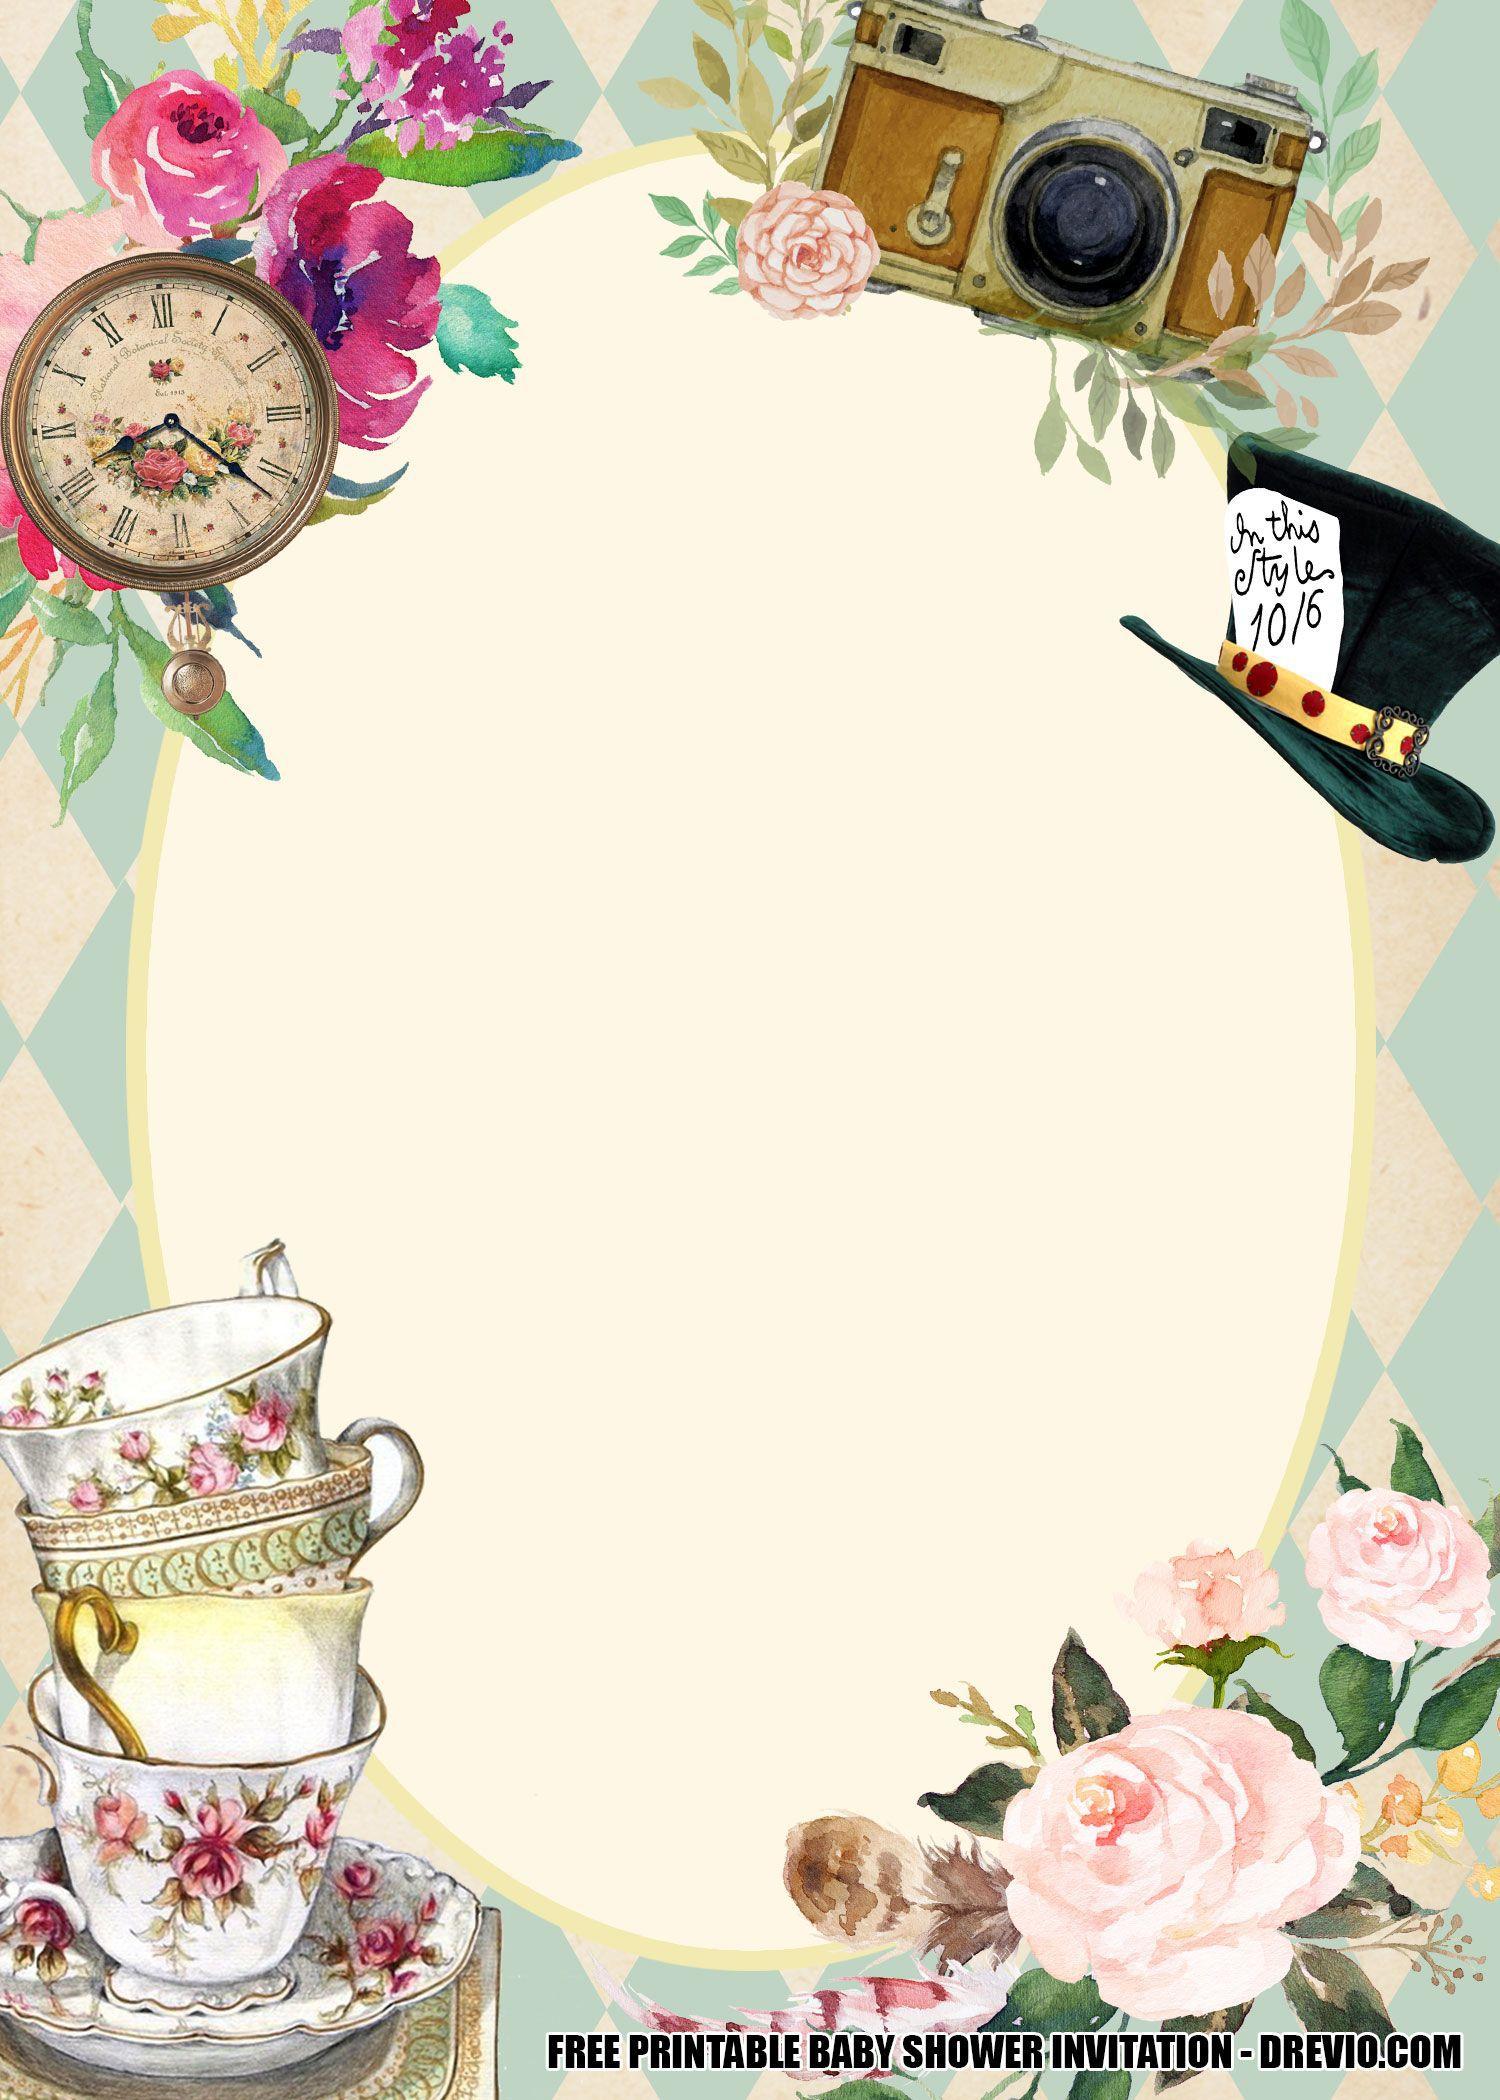 004 Sensational Alice In Wonderland Invite Template Design  Party Invitation FreeFull